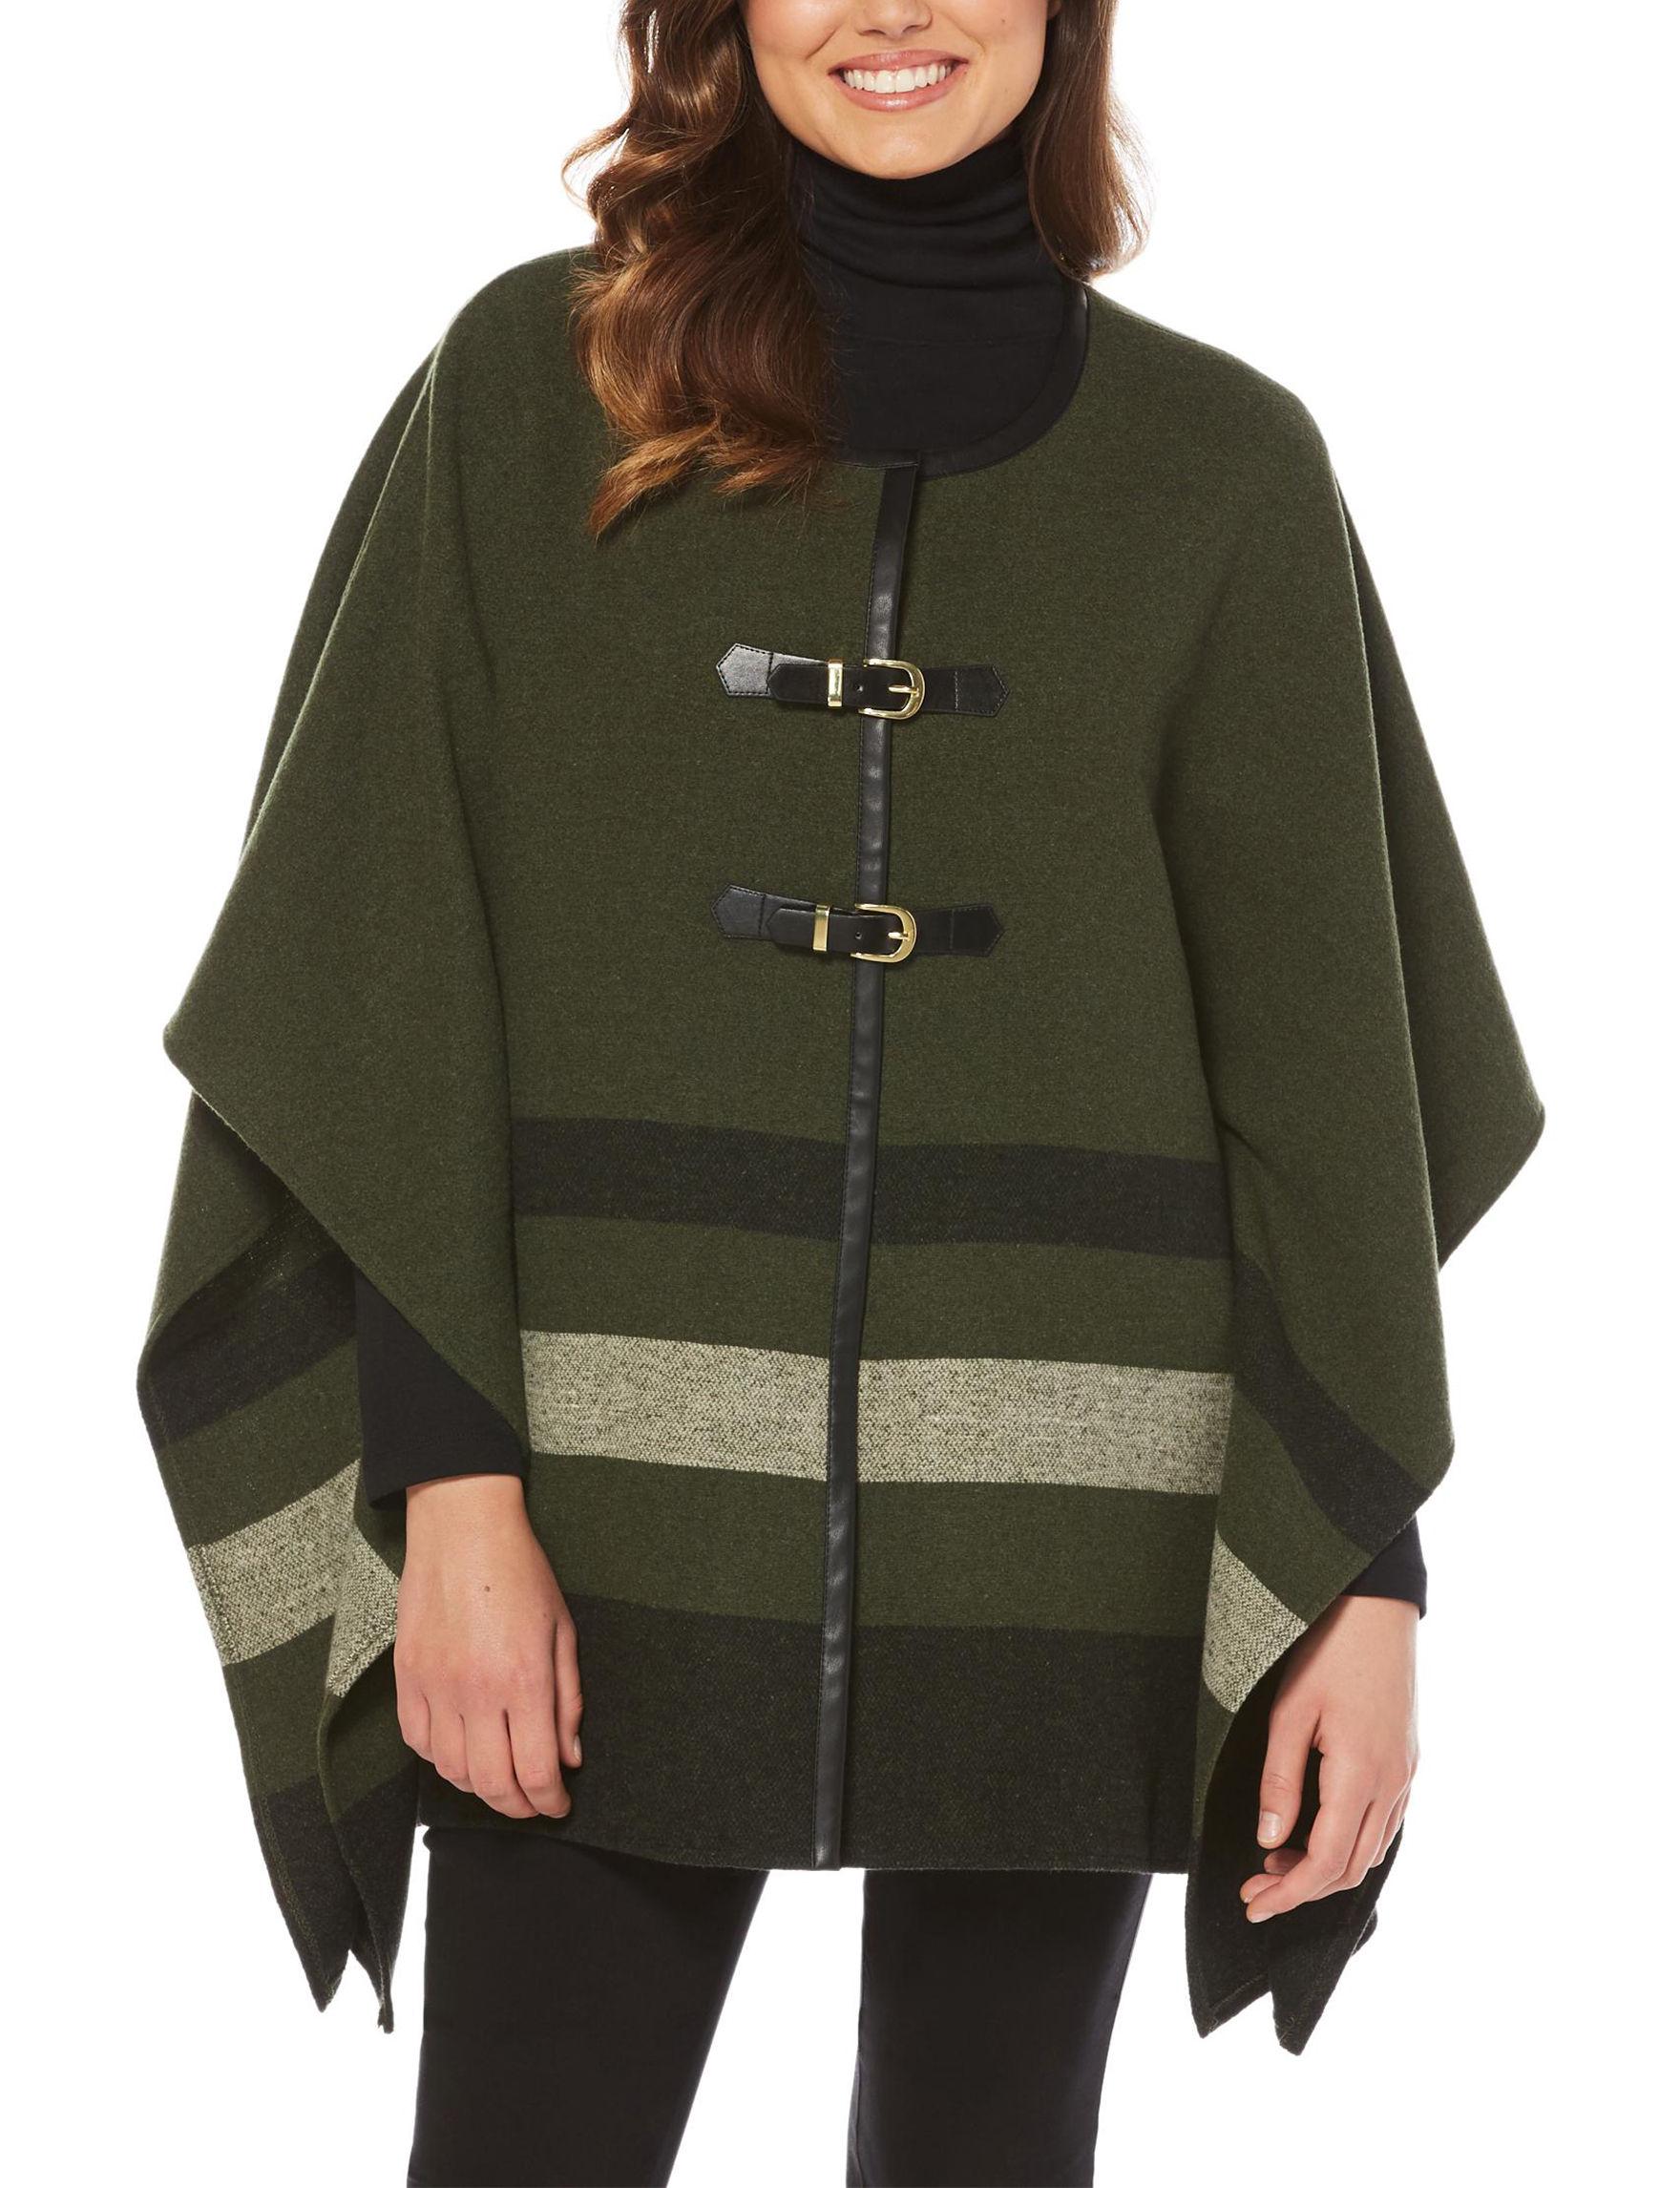 Rafaella Green Lightweight Jackets & Blazers Shirts & Blouses